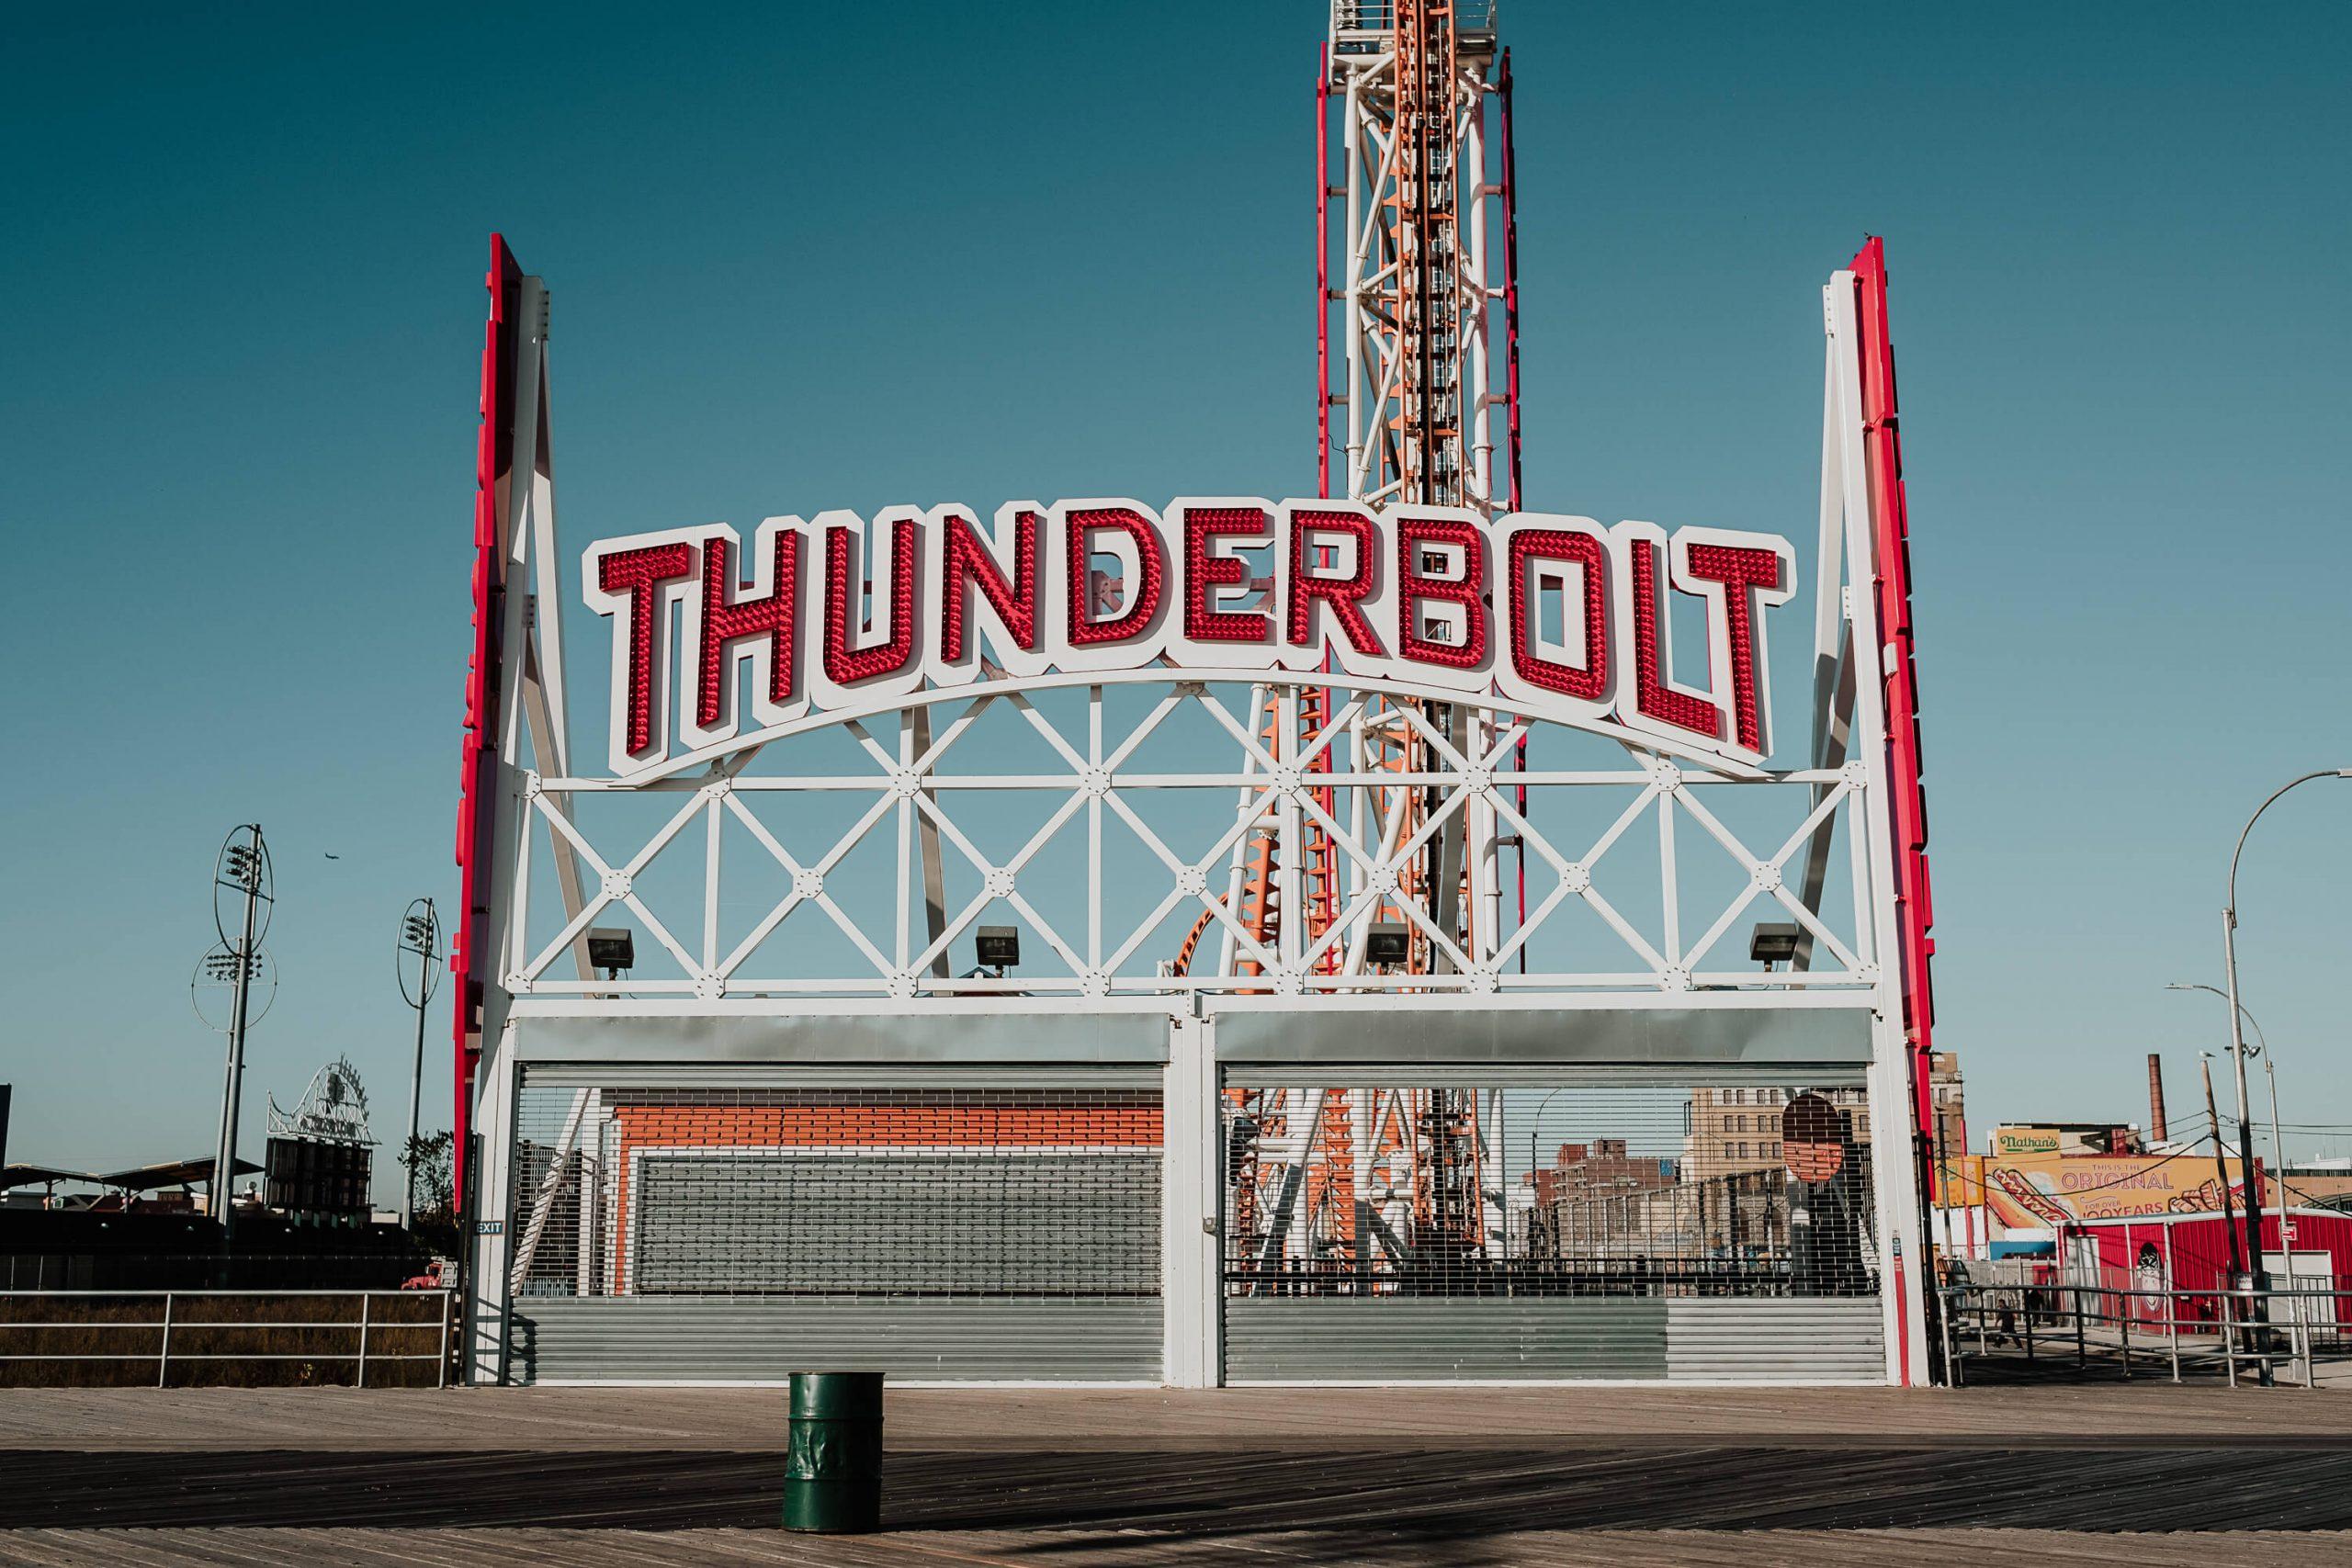 elisabetta riccio - urban vision - the thunderbolt at coney island